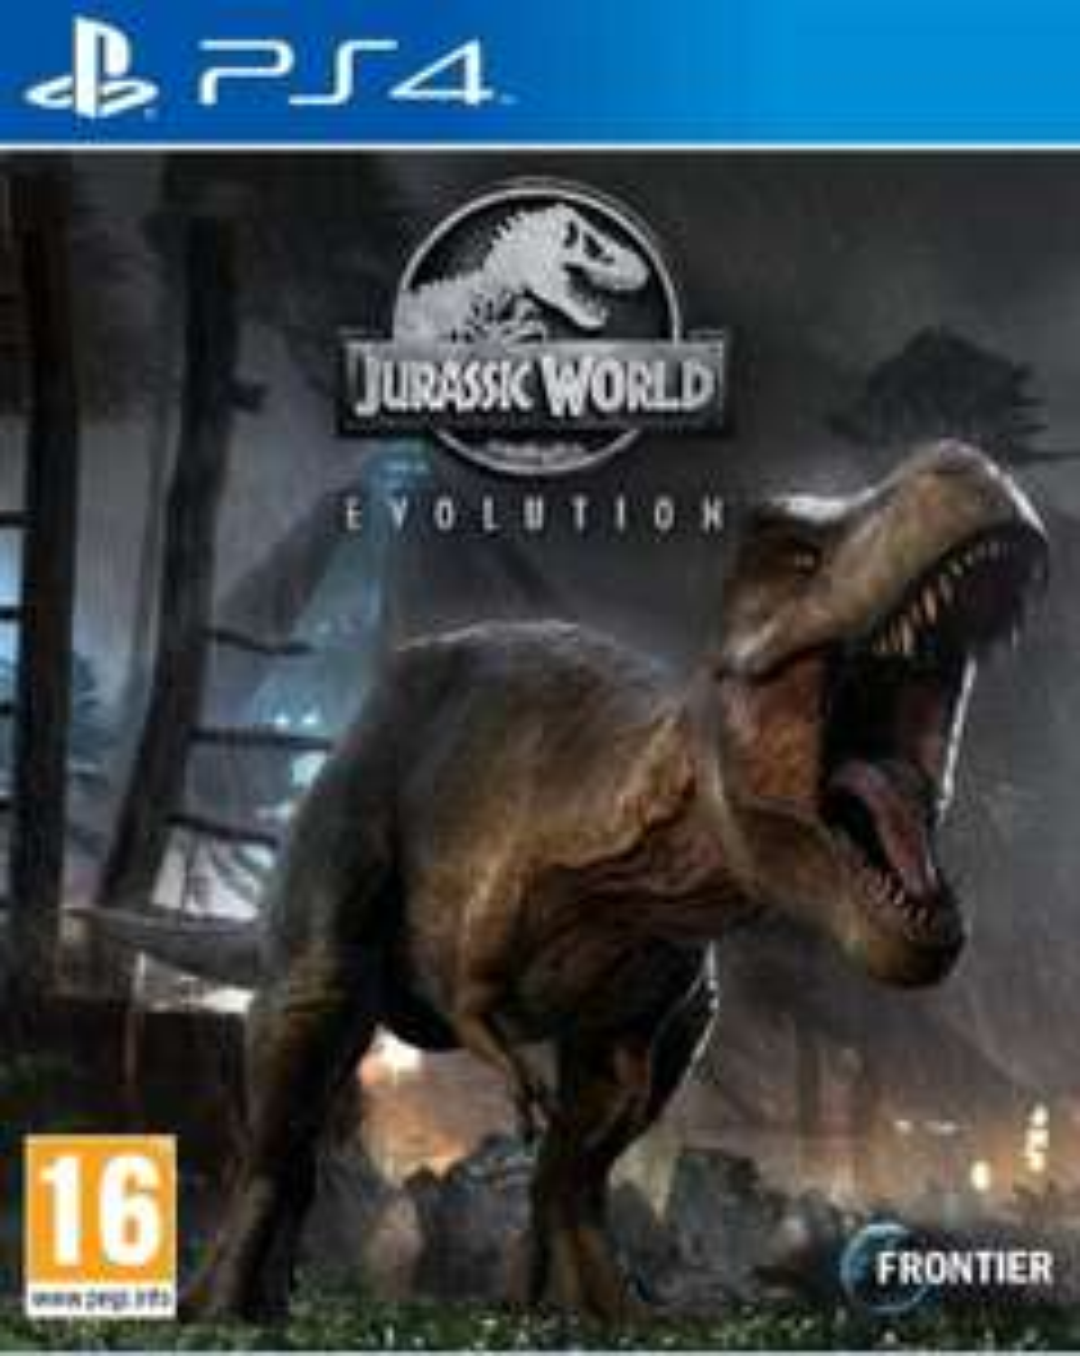 [Prime] Jurassic World: Evolution PS4 sur PS4